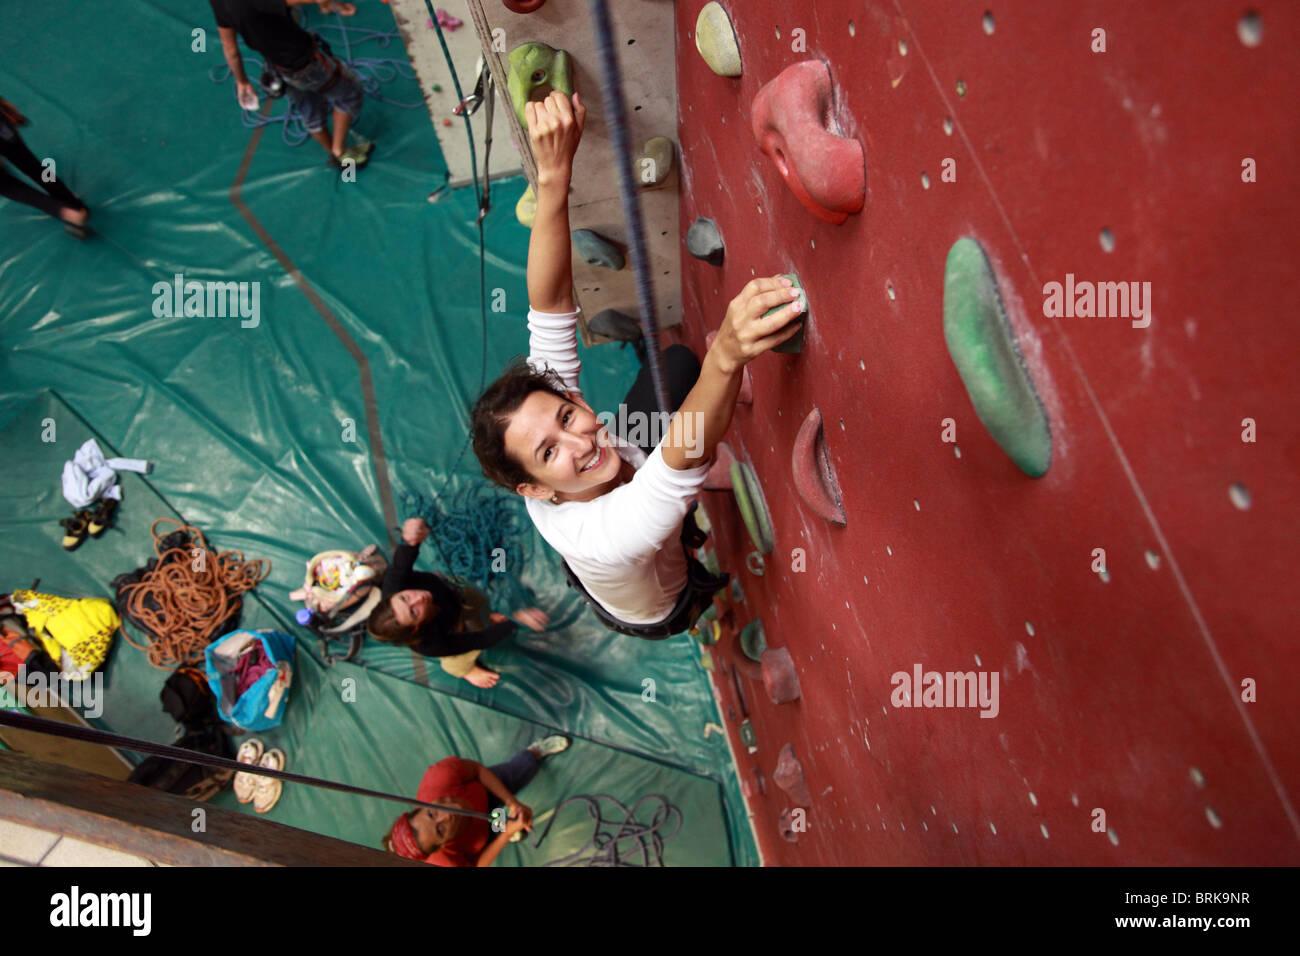 Girl in indoor climbing wall - Stock Image